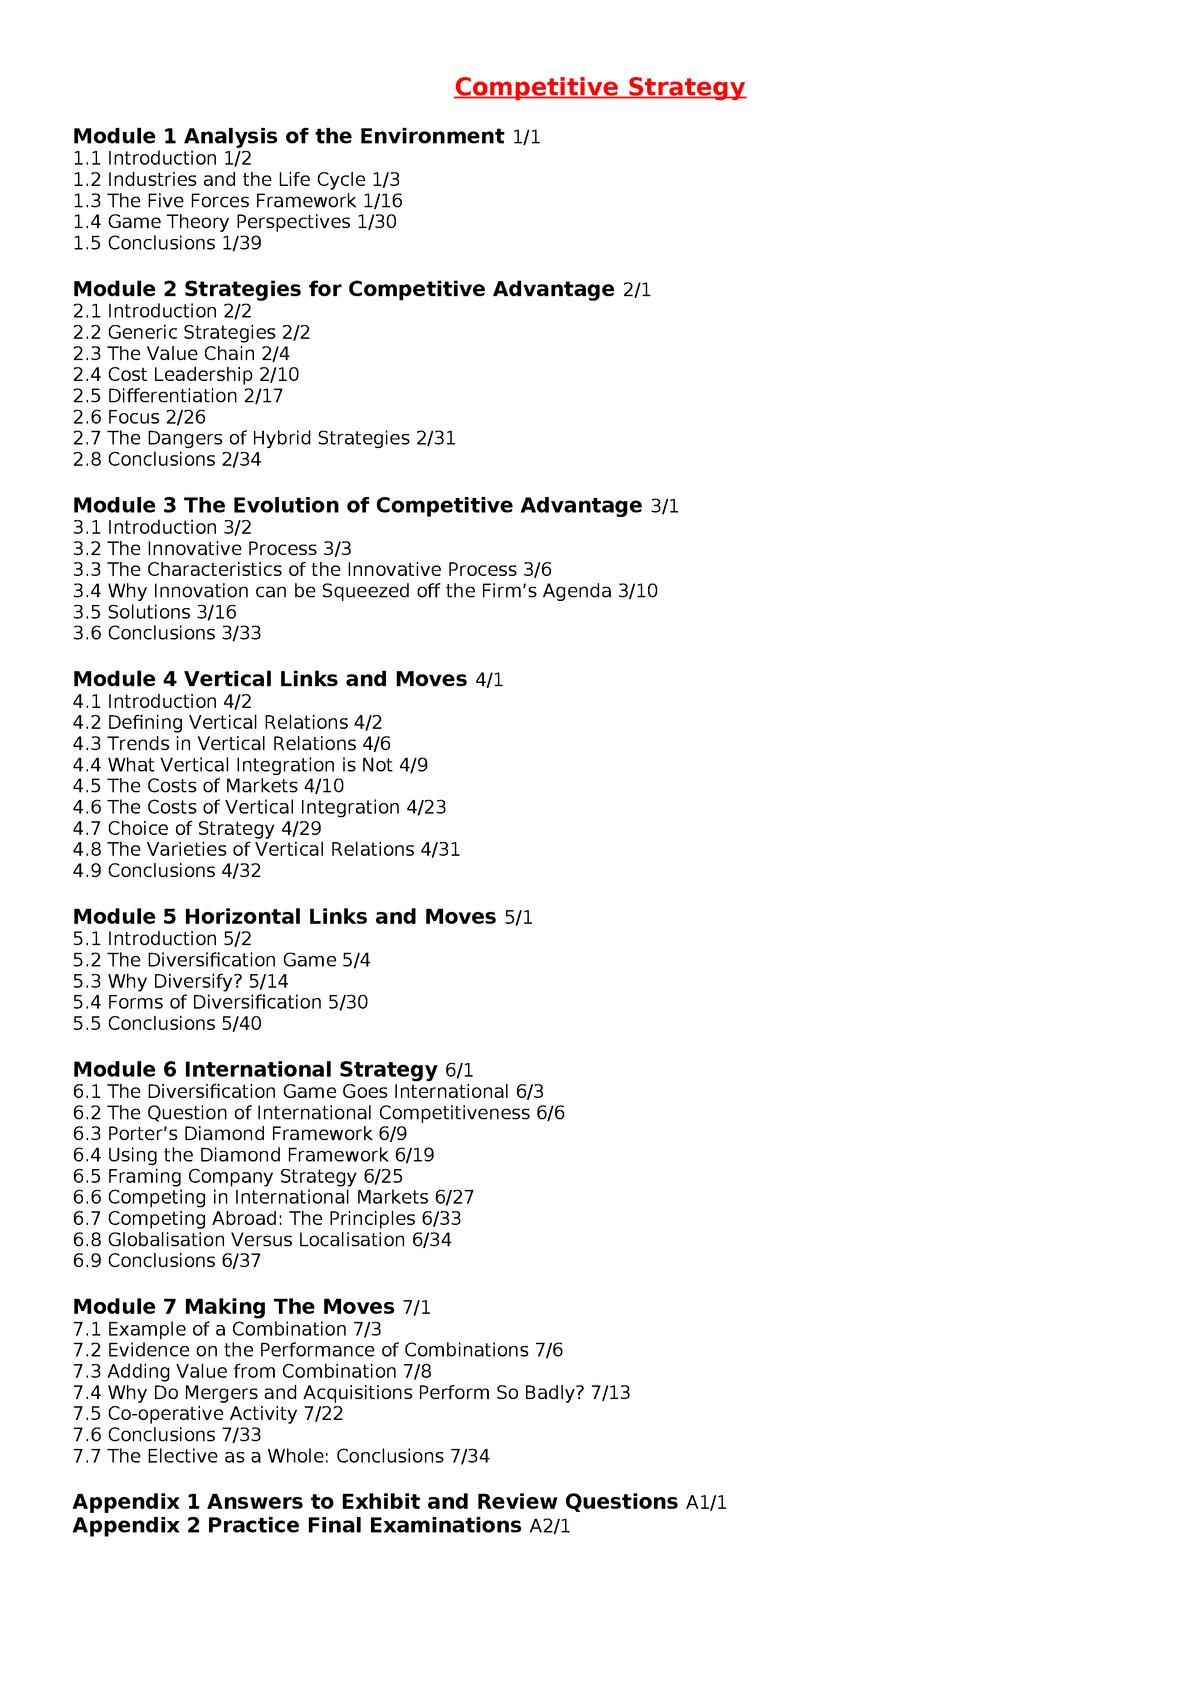 Competitive Strategy Notes - SCM523 - StuDocu